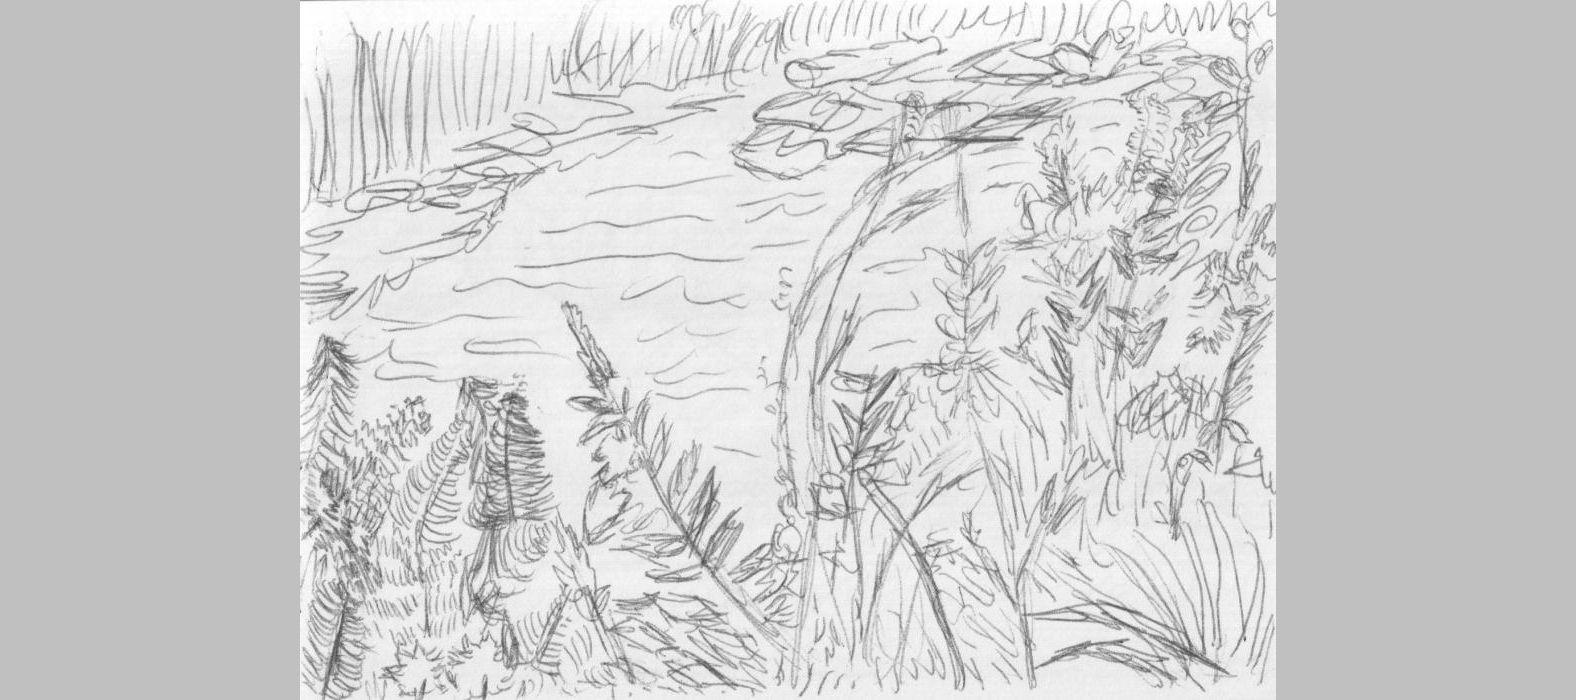 Skizze aus Skizzenheft (11, 2012, Format unbekannt)